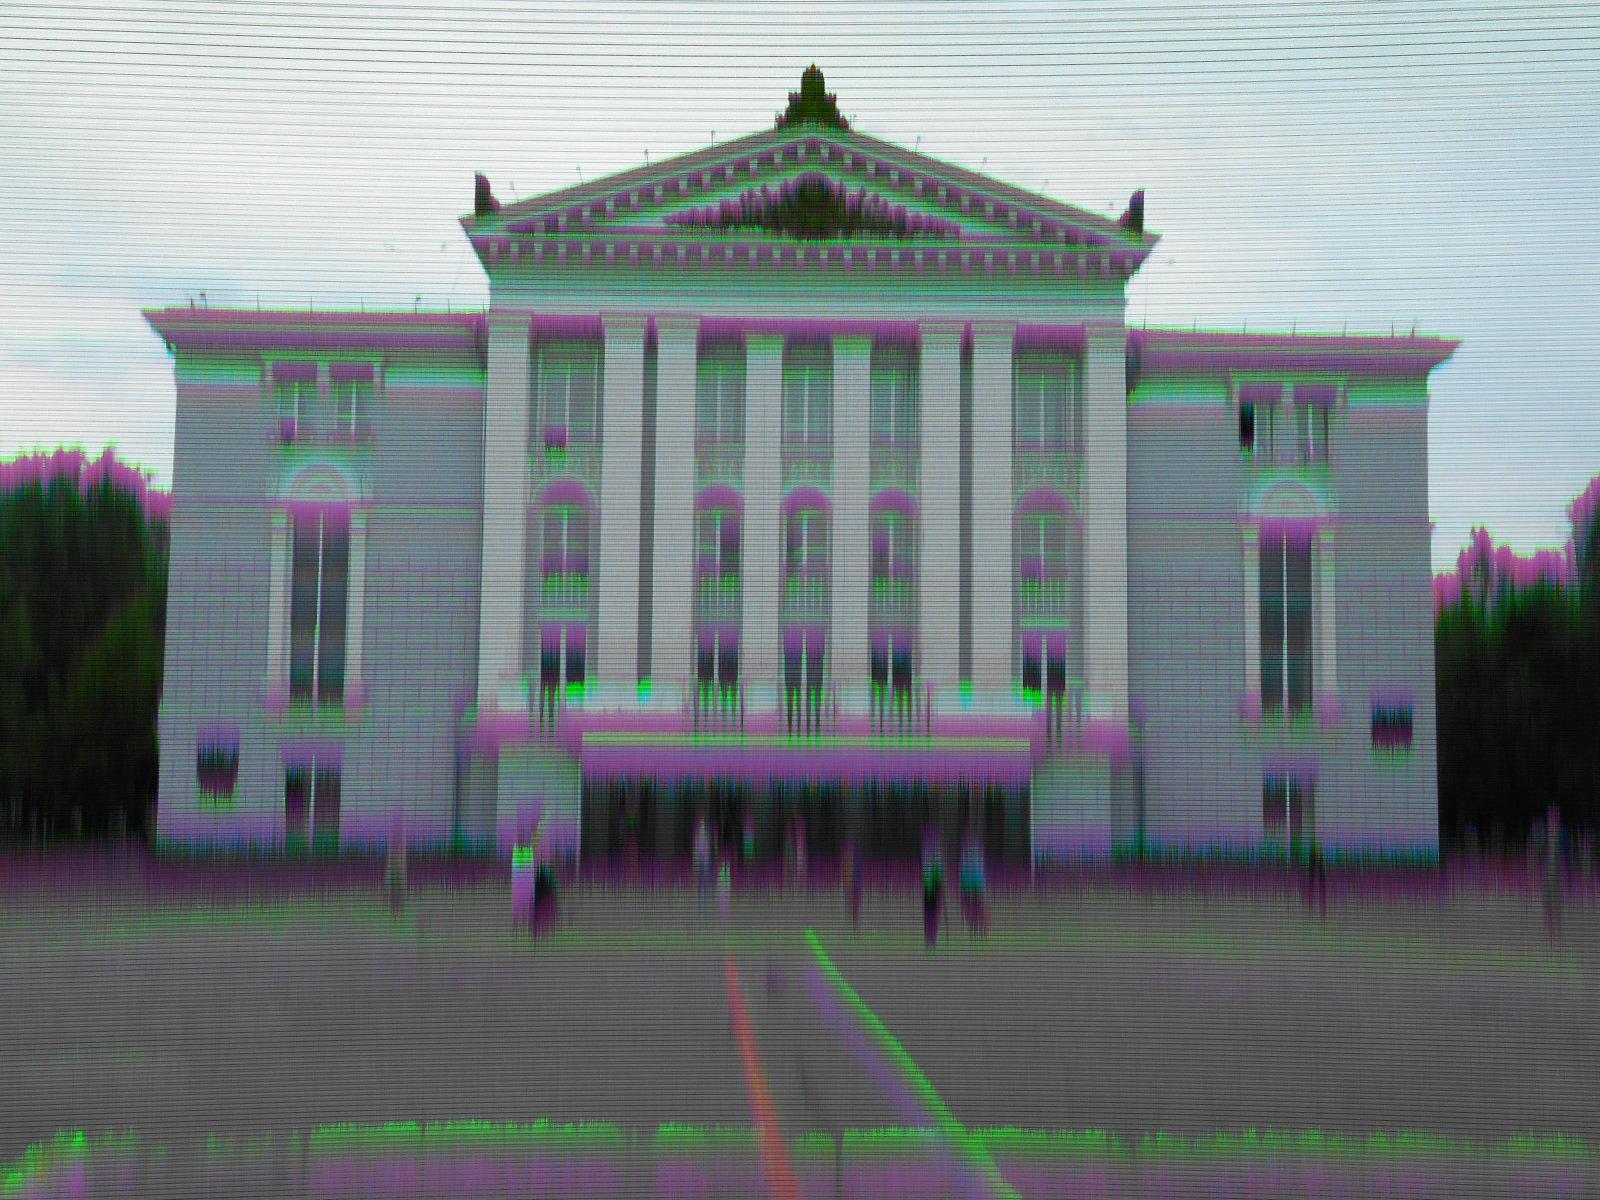 Krasivoe-Derevo-Muscovia Part 2